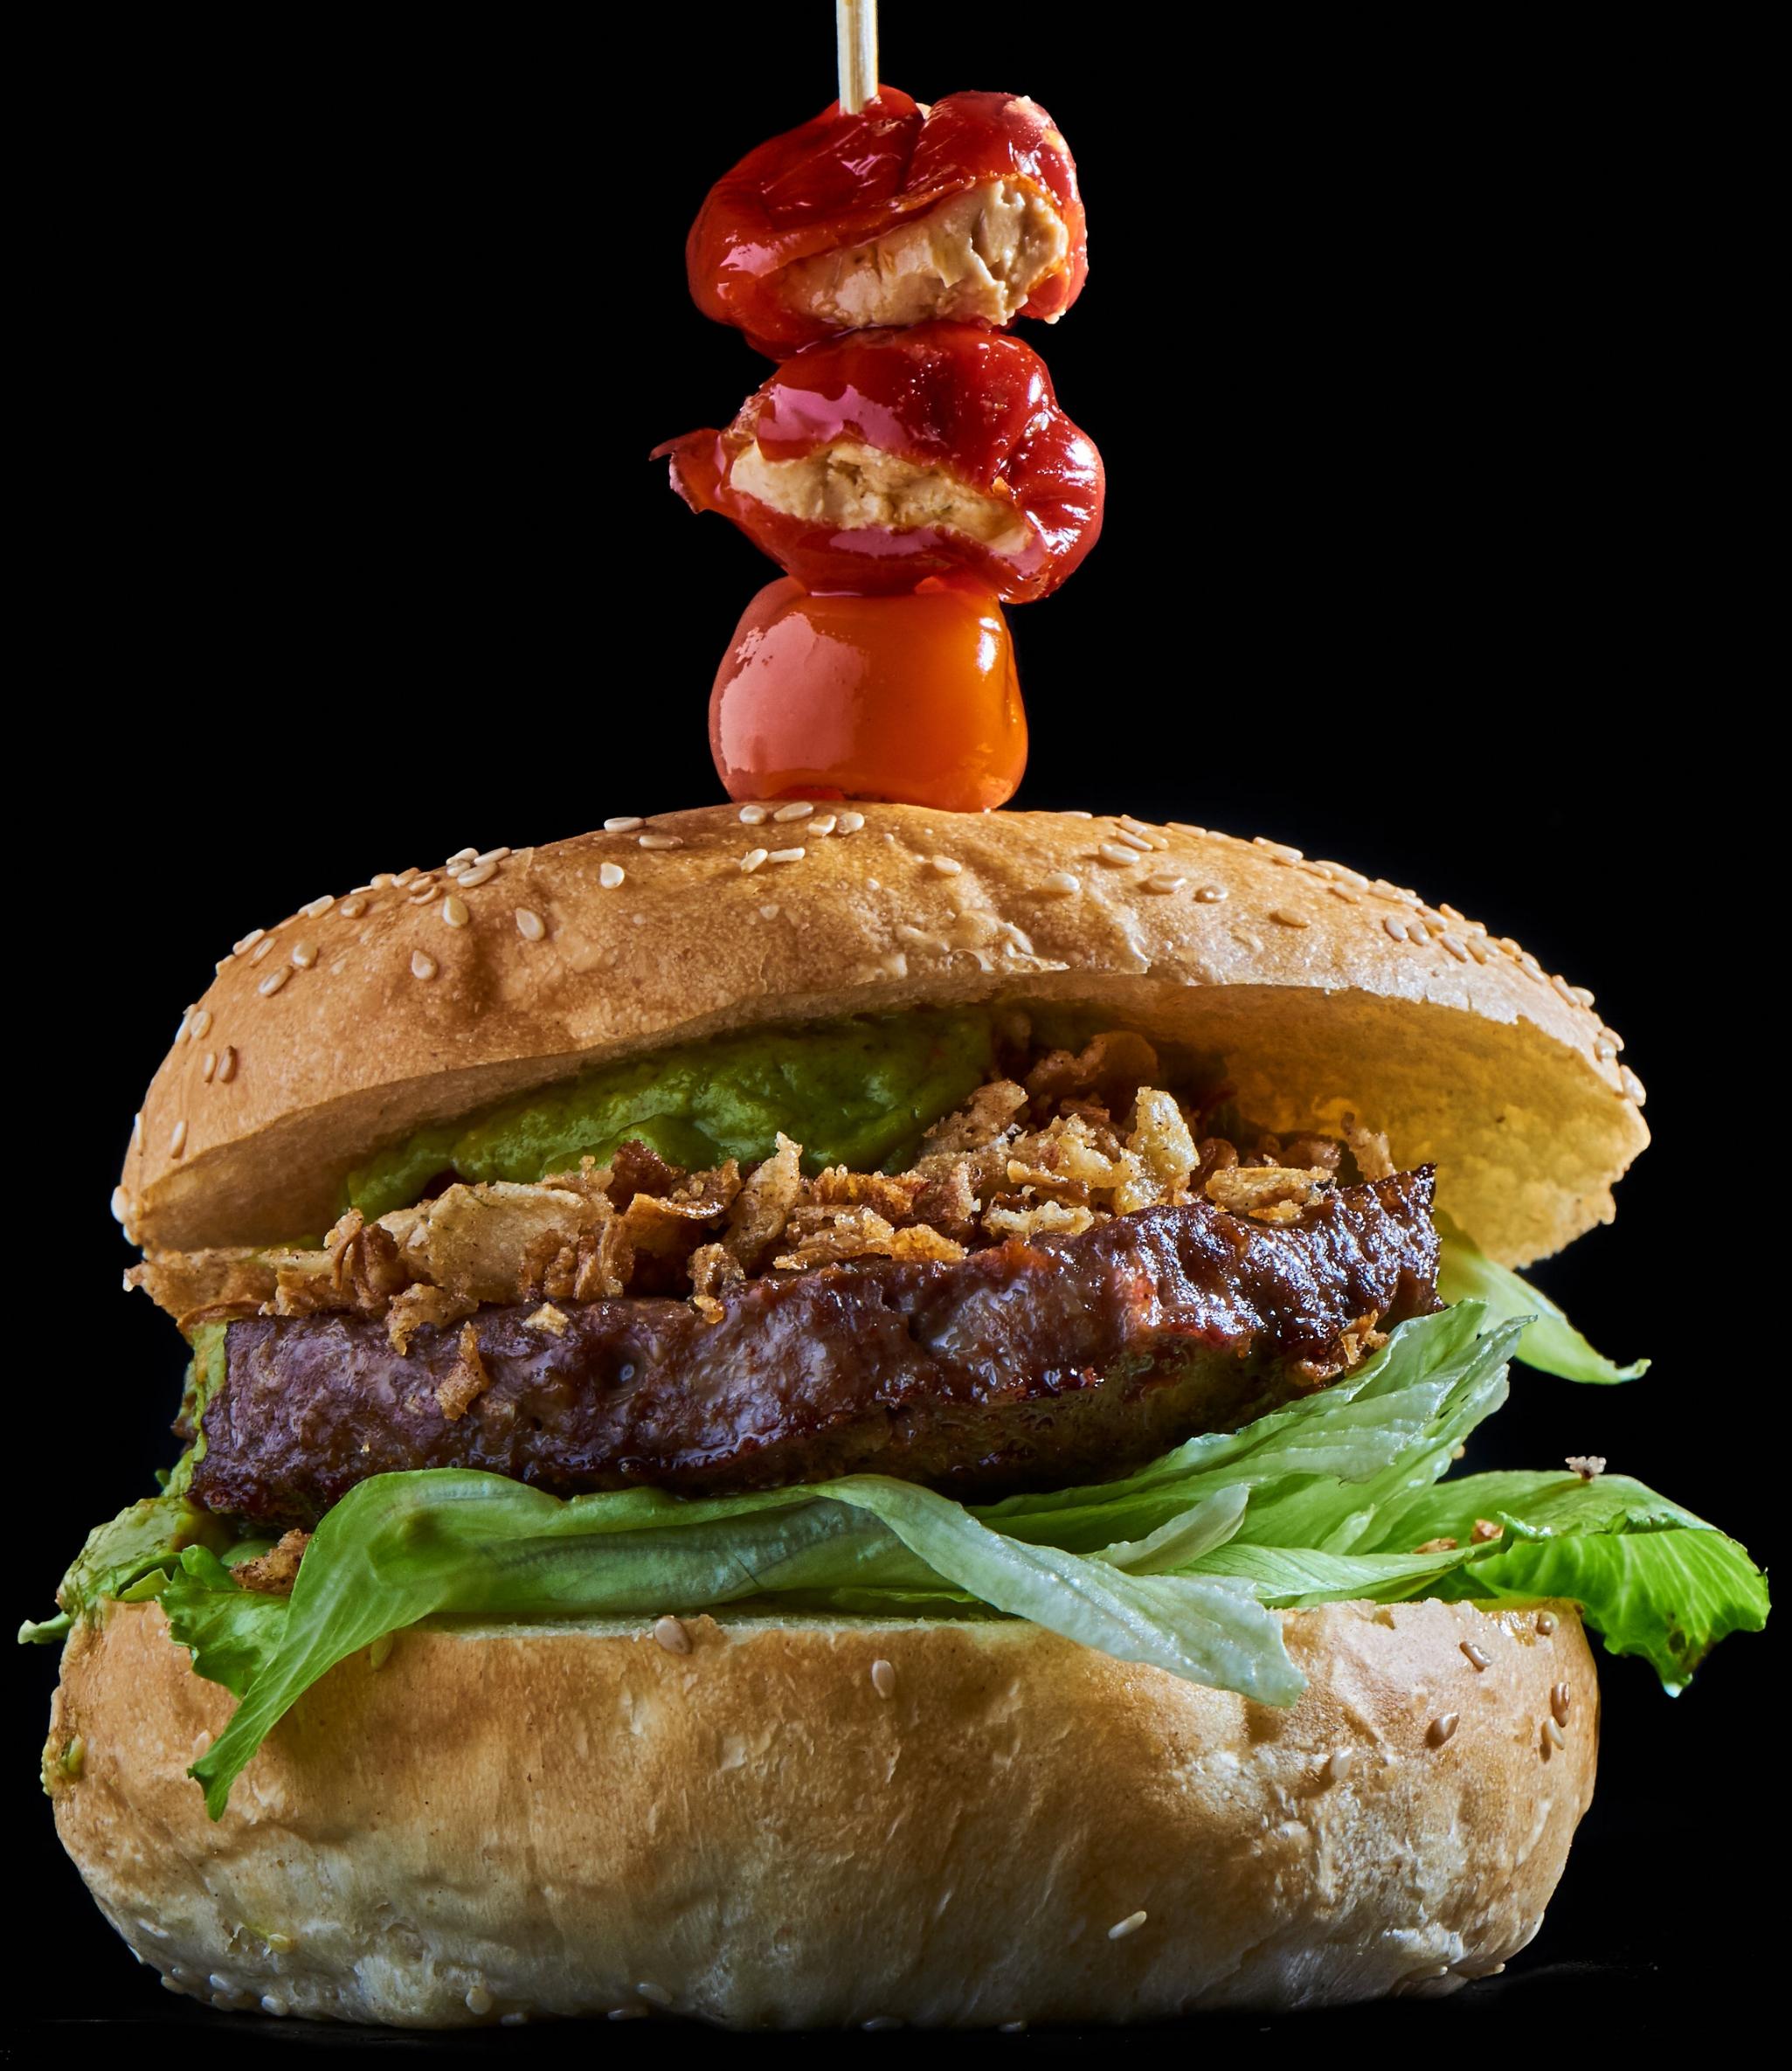 Mexican Burger - mit Röstzwiebeln, Guacamole, Chipotle-Salsa, Jalapeños, Eisbergsalat, Salatgurke und Tomate16.70